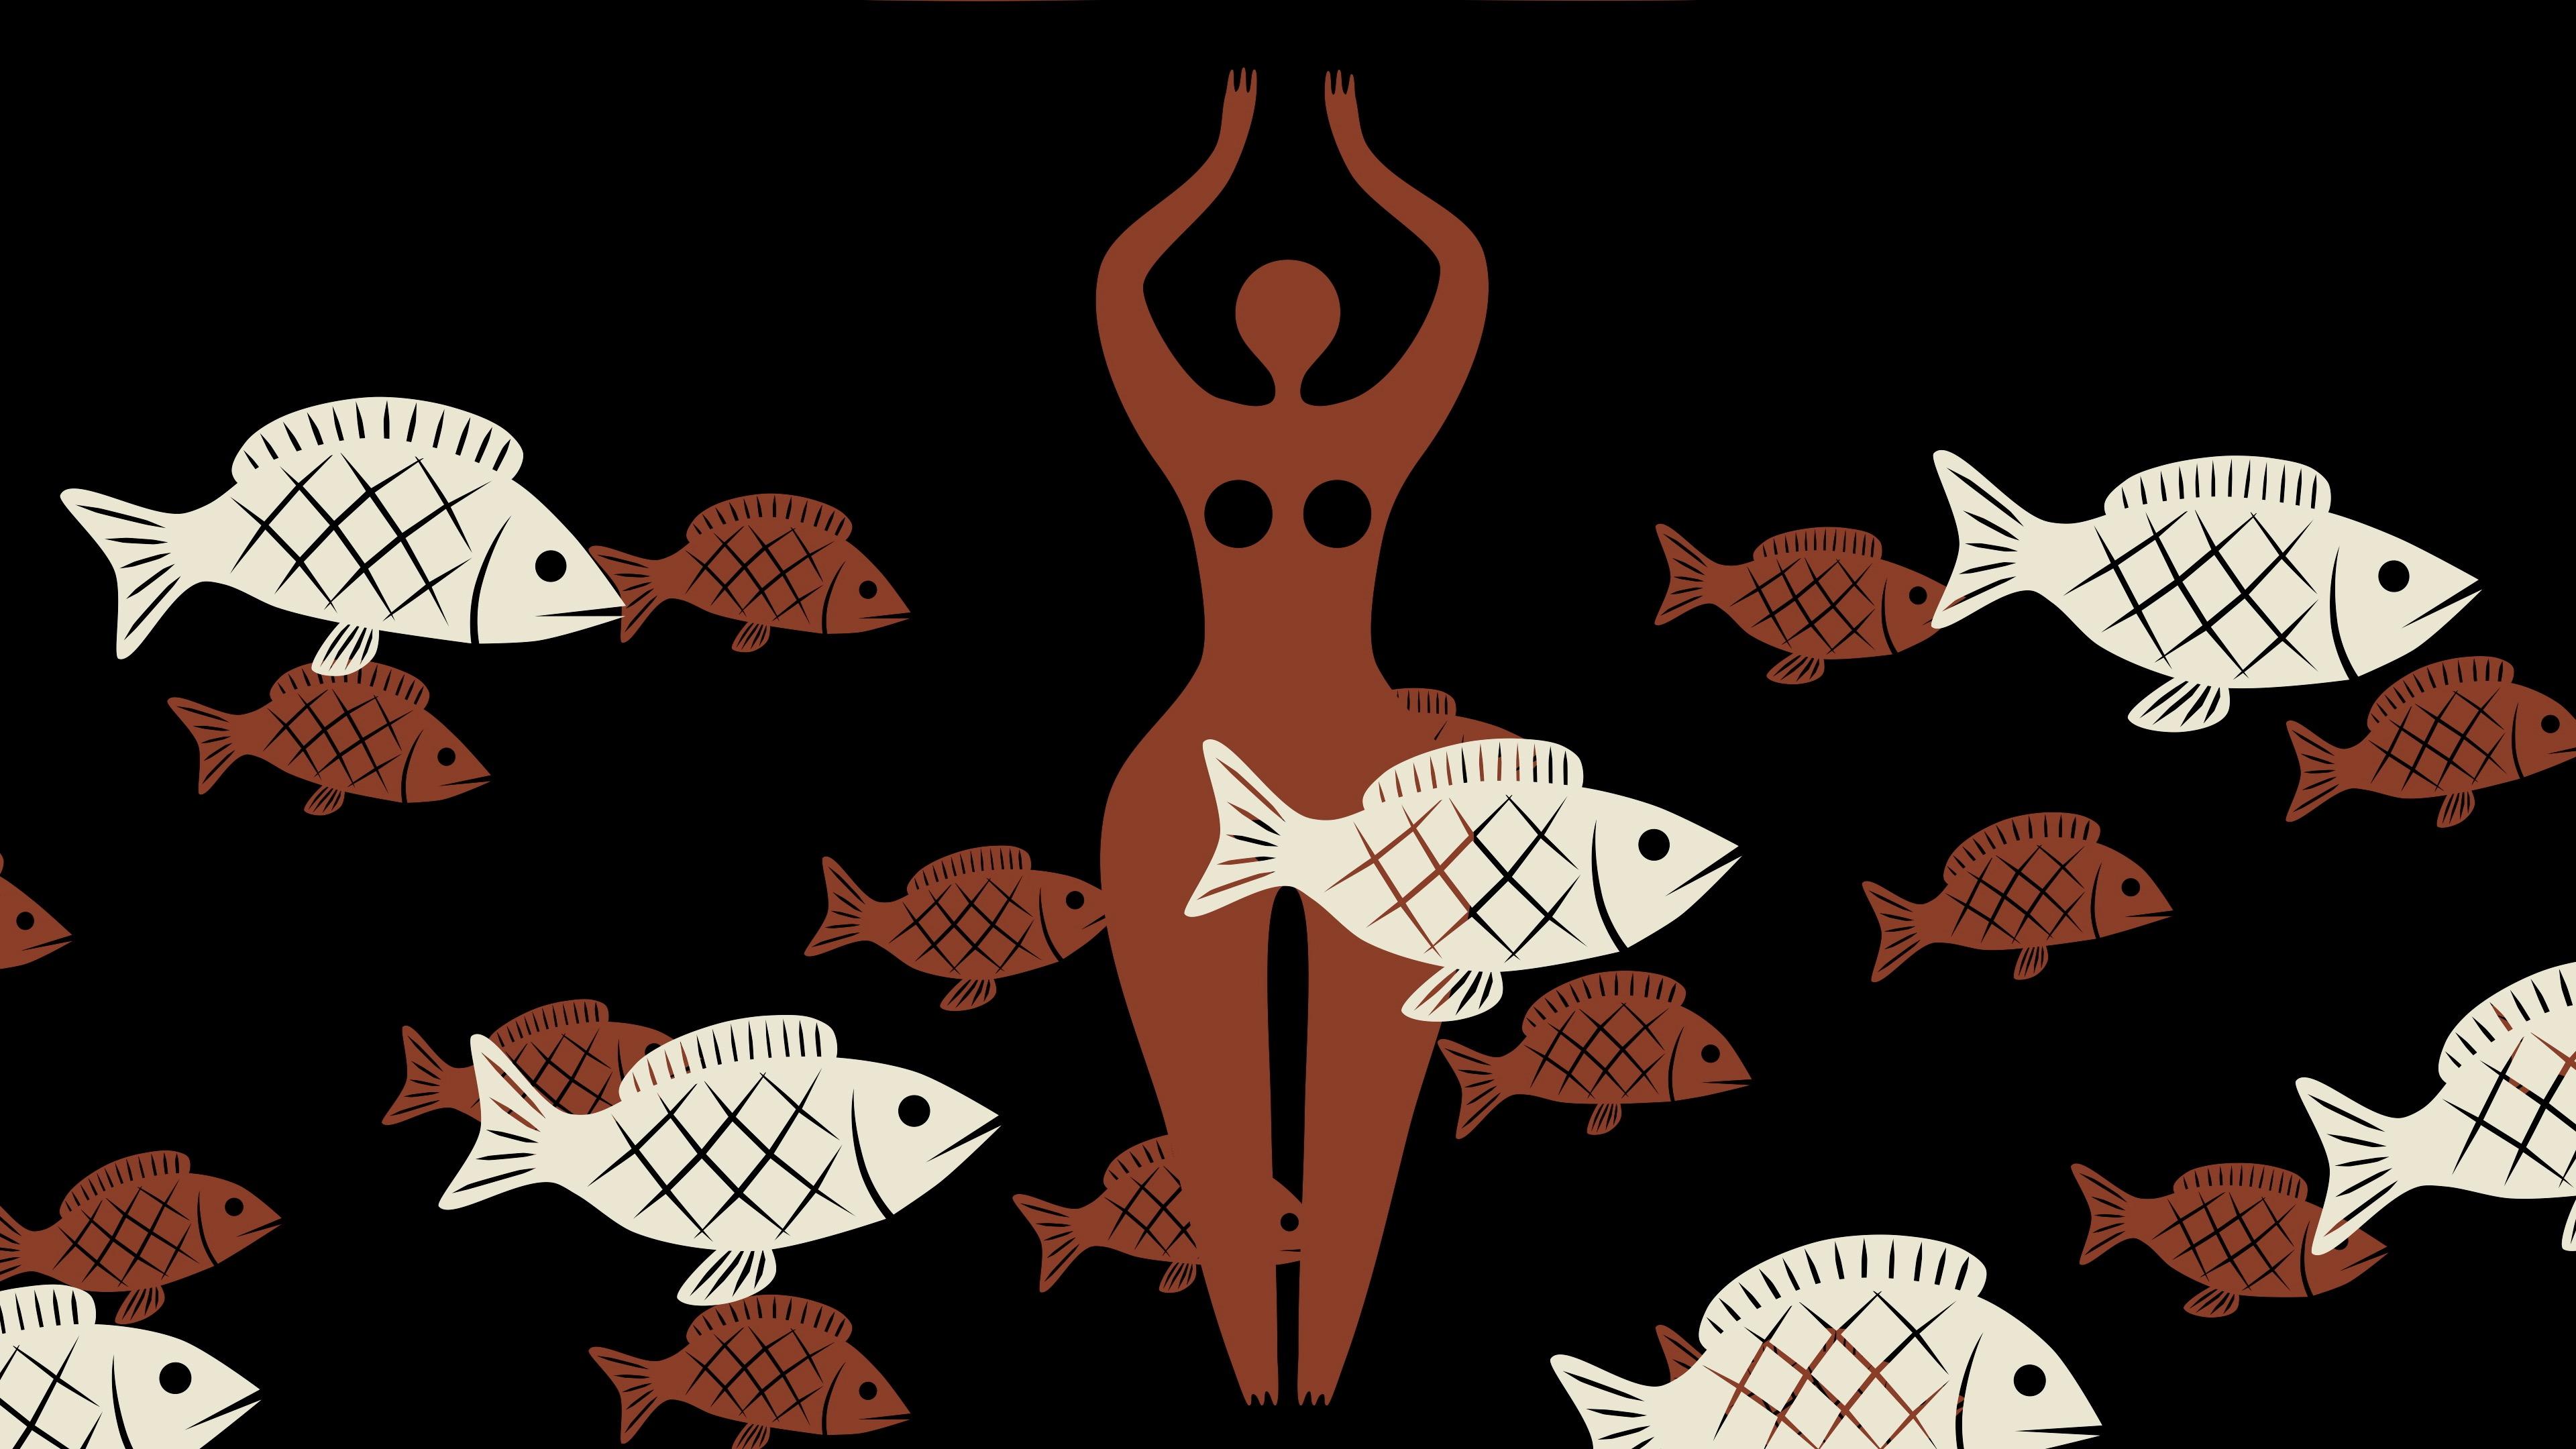 Seder-Masochism Review: Let's Dance